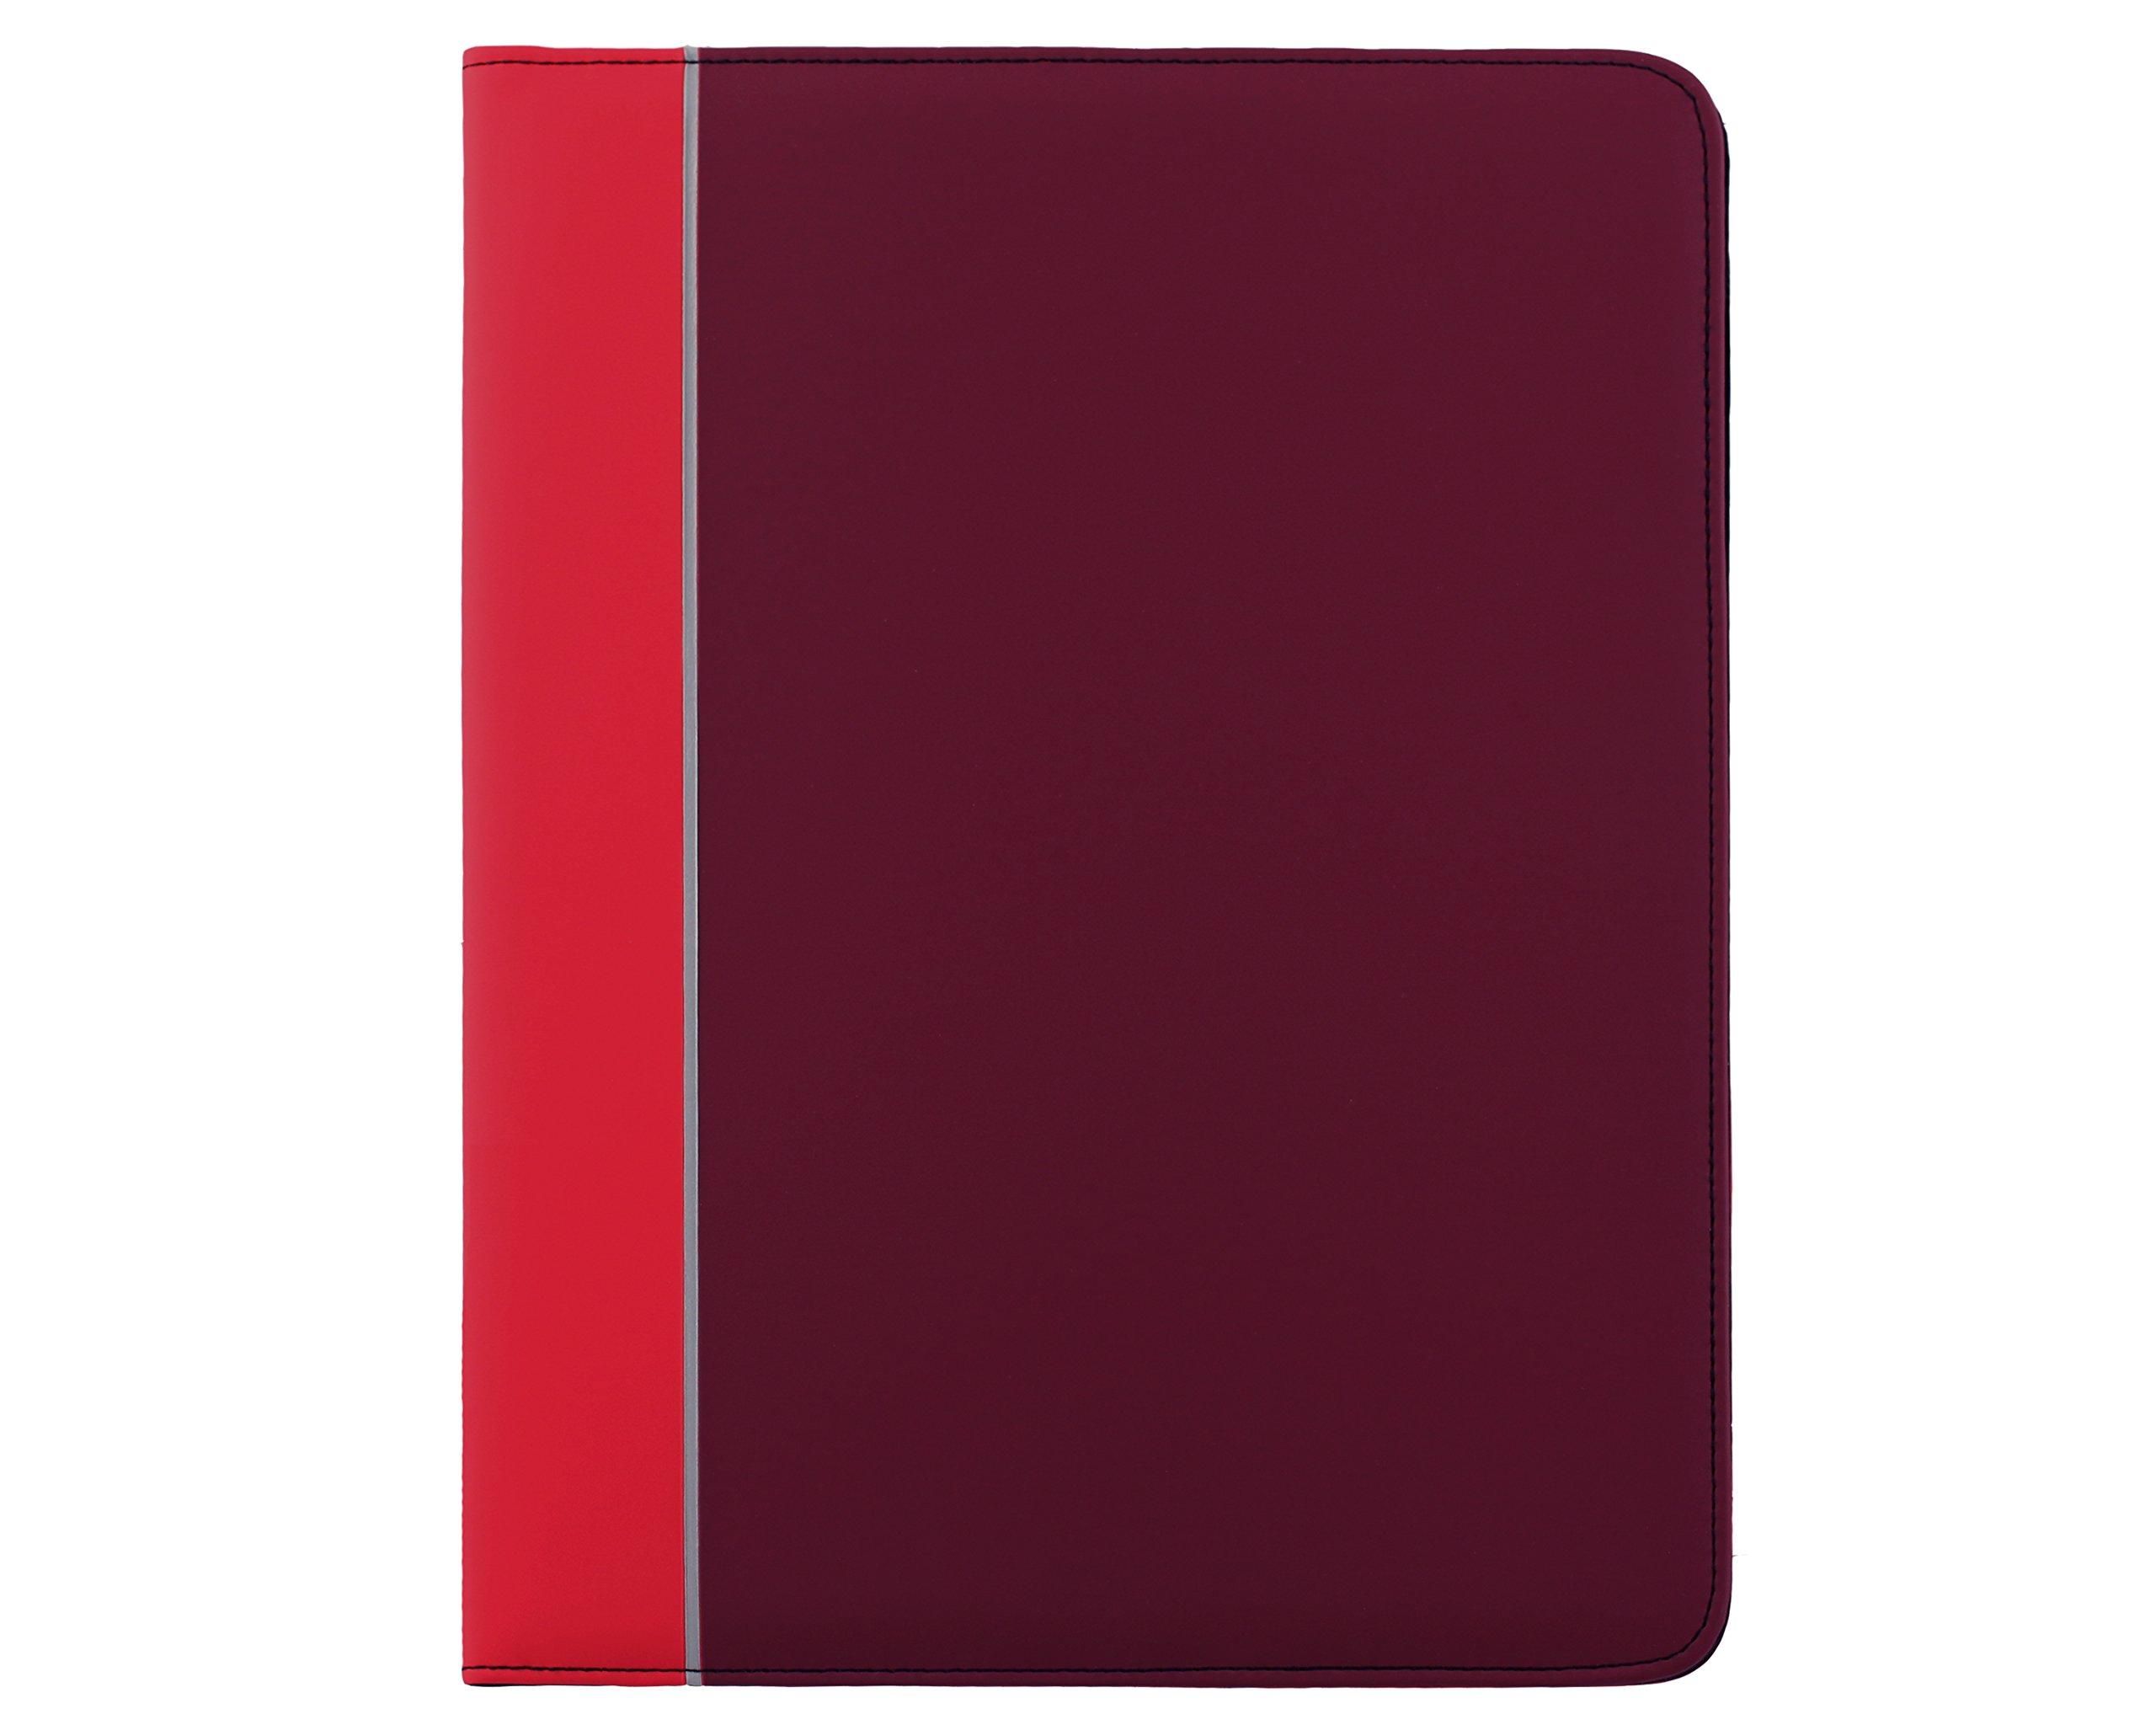 Red Padfolio, Tonal Writing Padfolio and Resume Holder with BONUS Pad Red desk folder